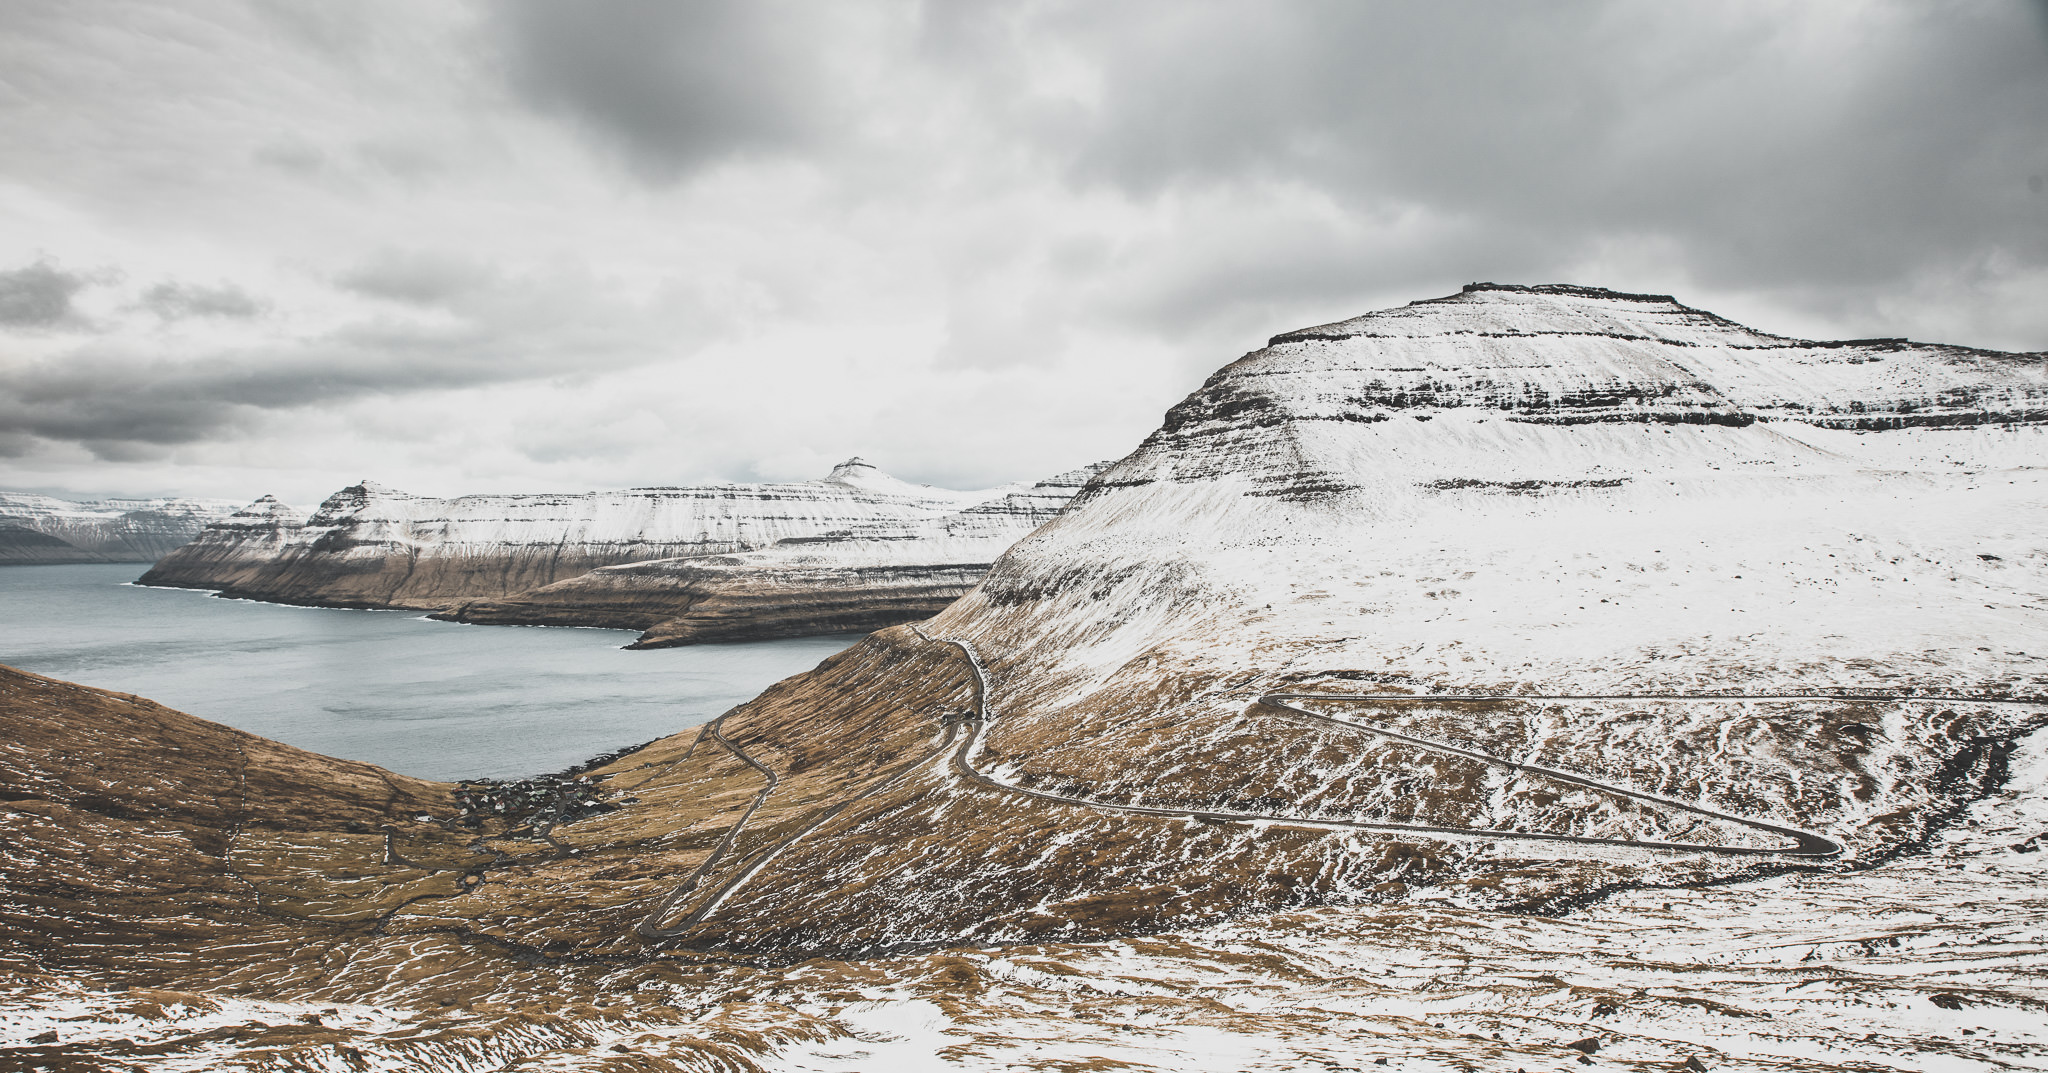 FaroeIslands-FunningurRoad-Instagram-HansChristianStrikert-1.jpg